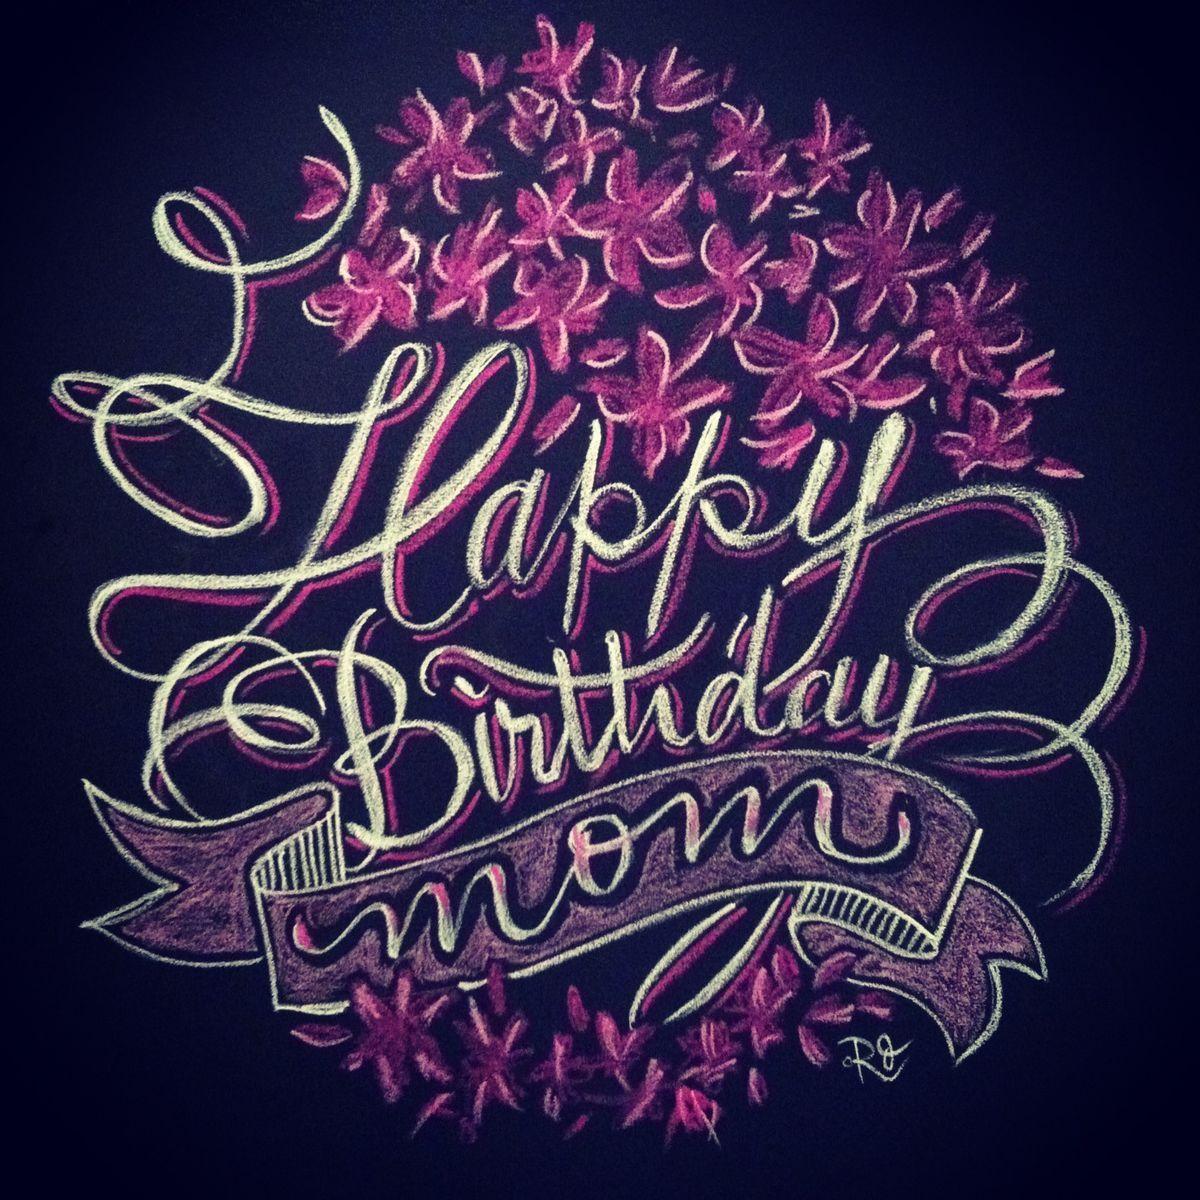 3a9d643f000bba31bed5e6d86b193690 Jpg 1 200 1 200 Pixels Happy Birthday Mom Images Happy Birthday Mom Happy Birthday Mom Quotes